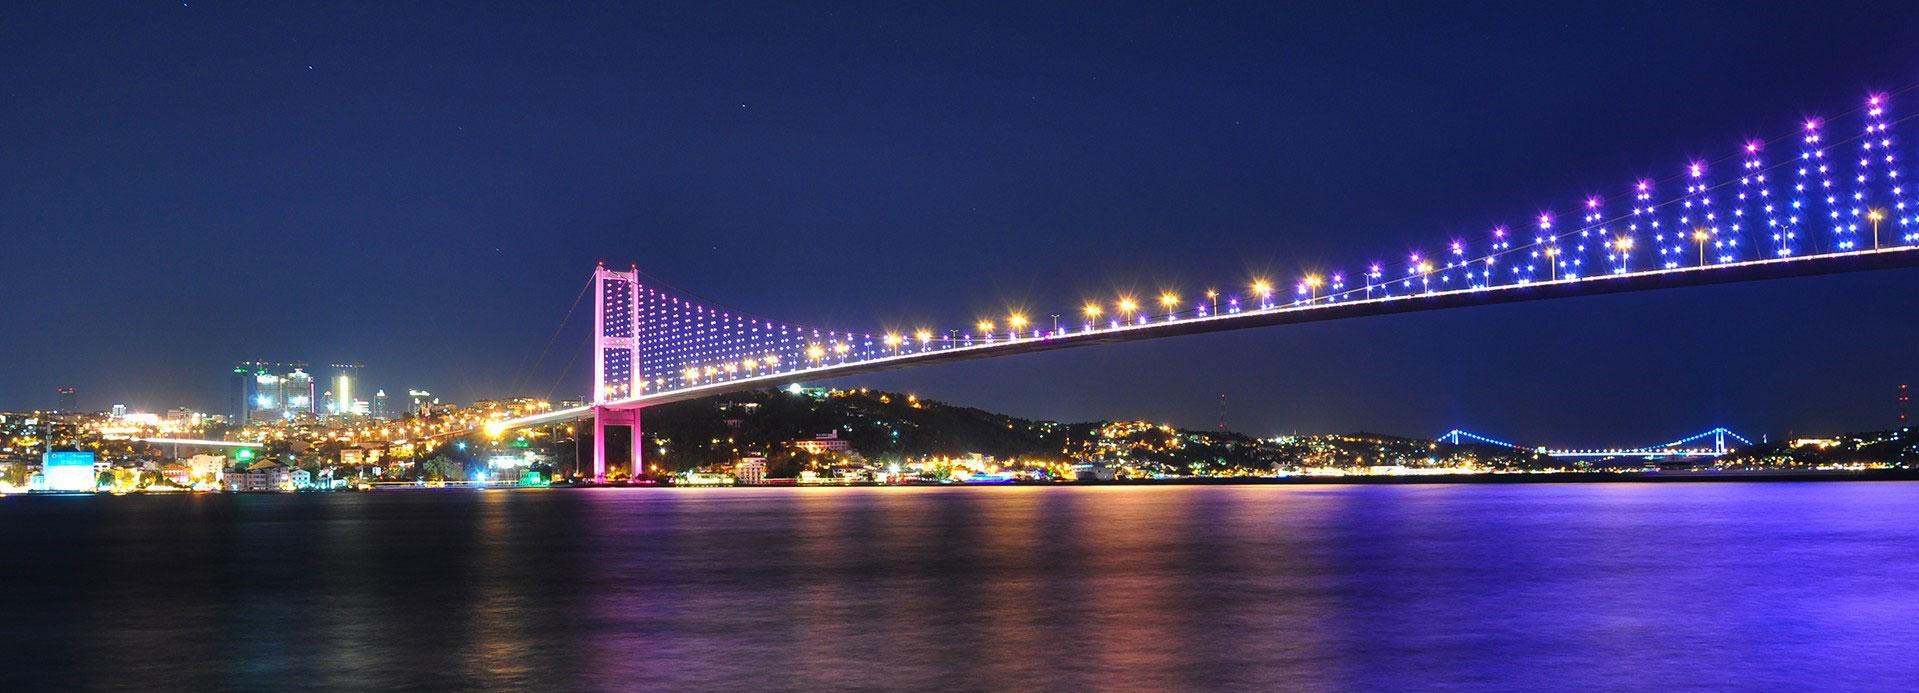 İstanbul özel tekne turu